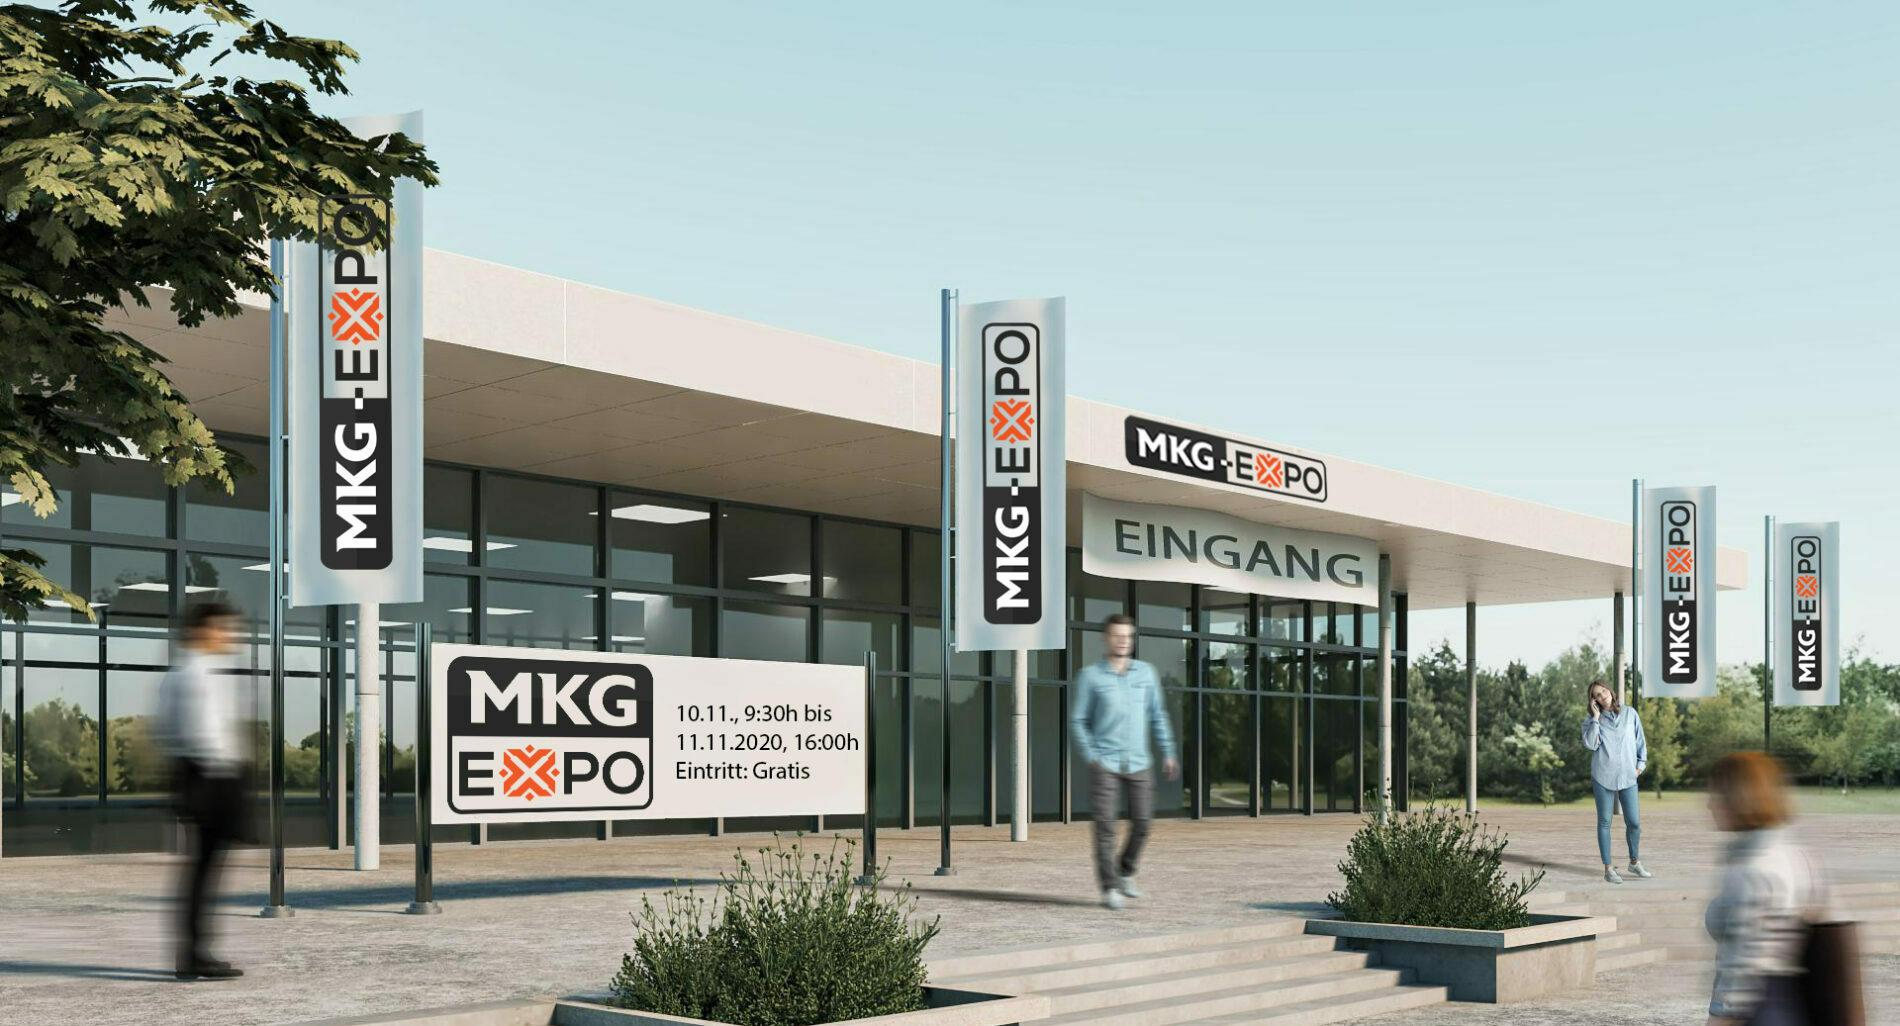 MkG-Expo